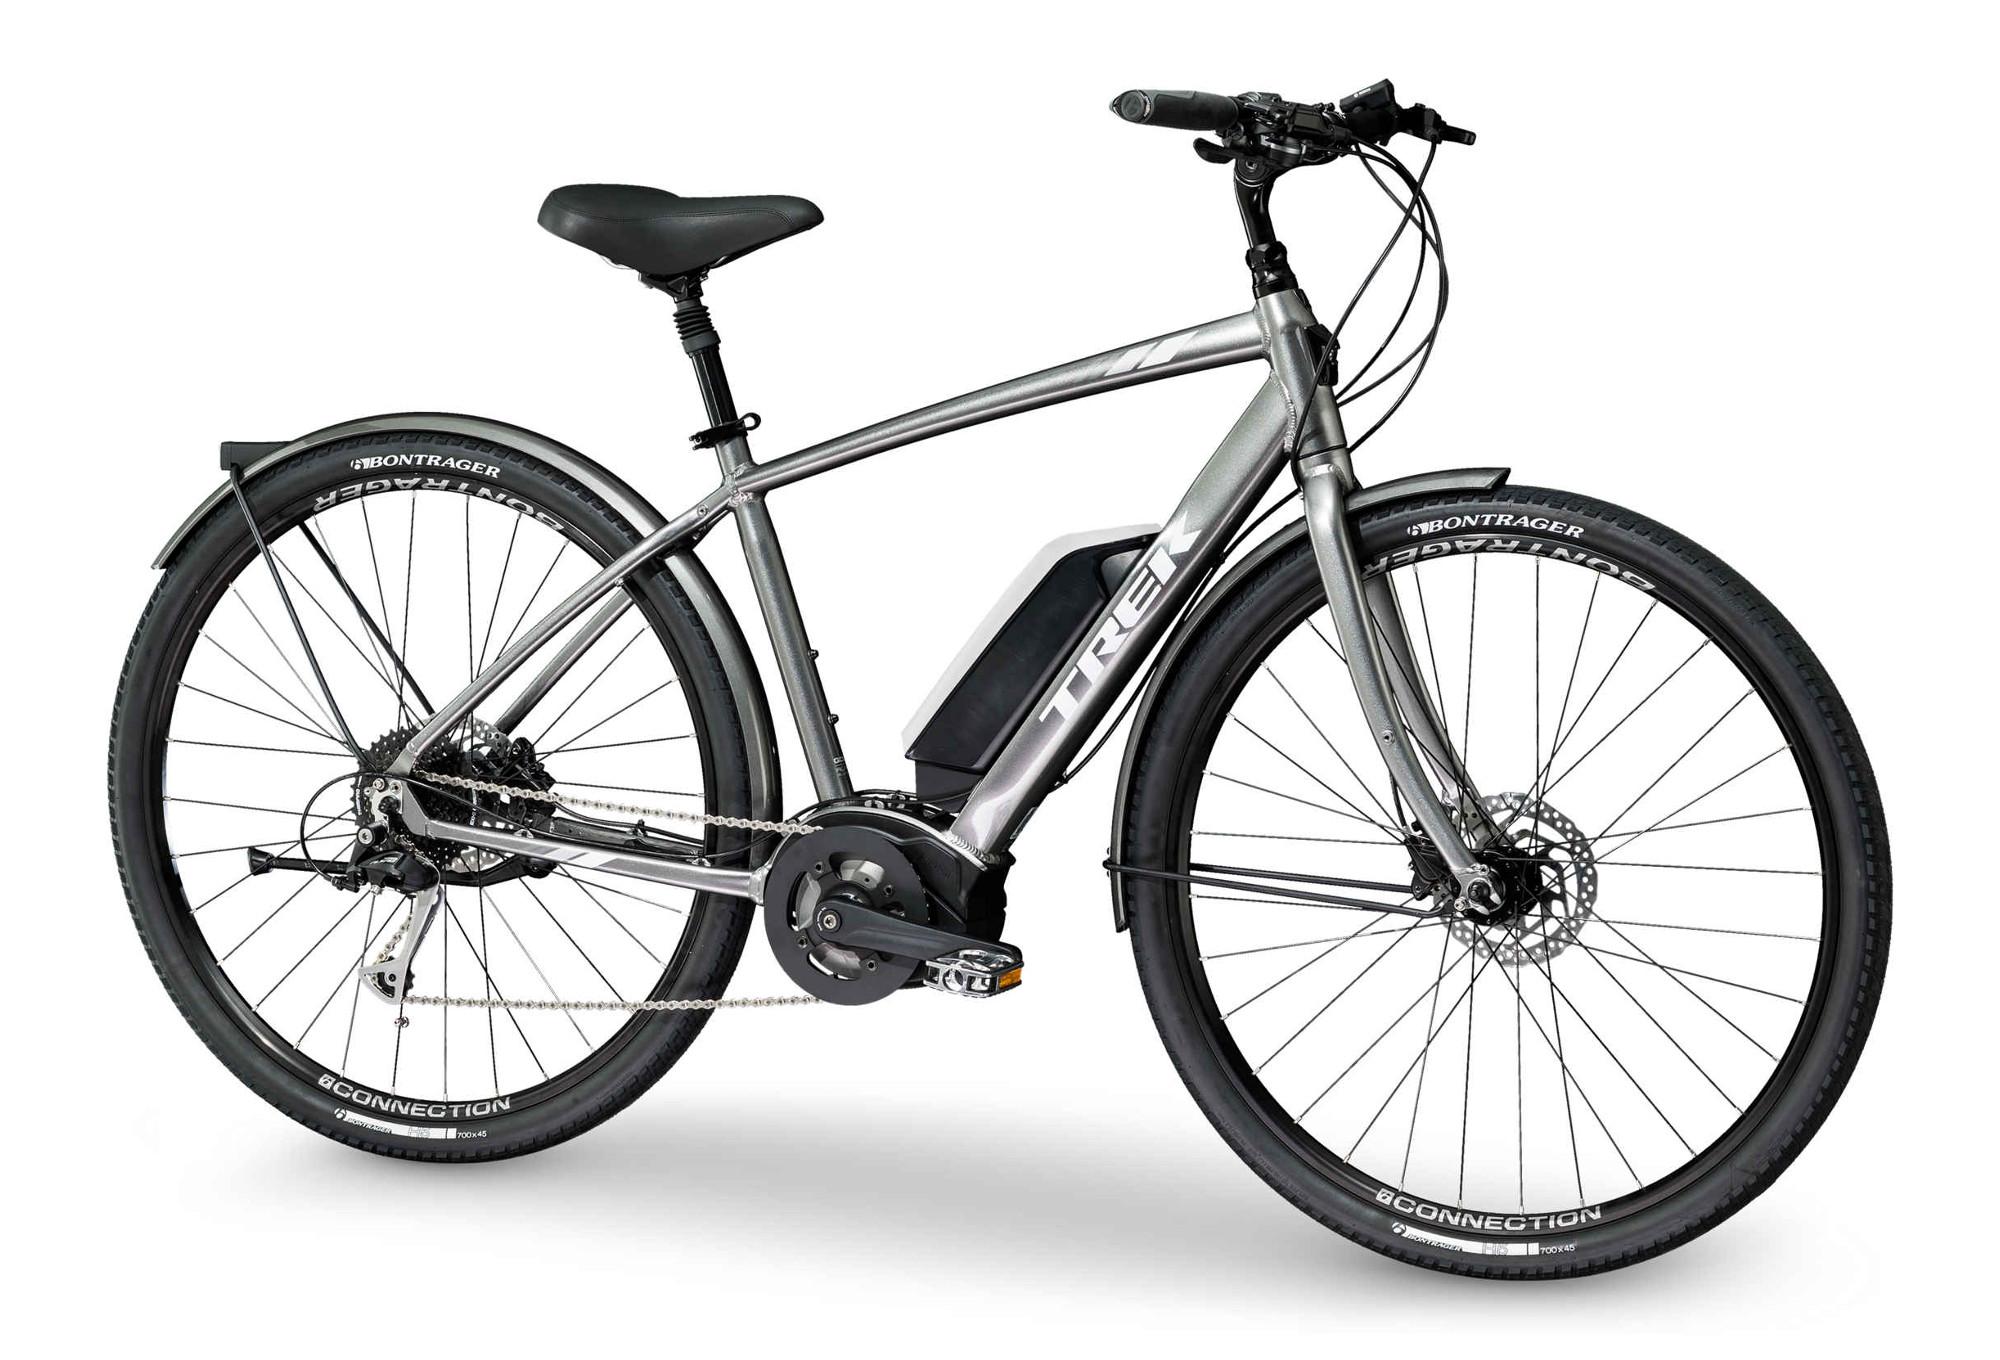 trek verve hybrid urban bike shimano alivio 9s grey 2019. Black Bedroom Furniture Sets. Home Design Ideas